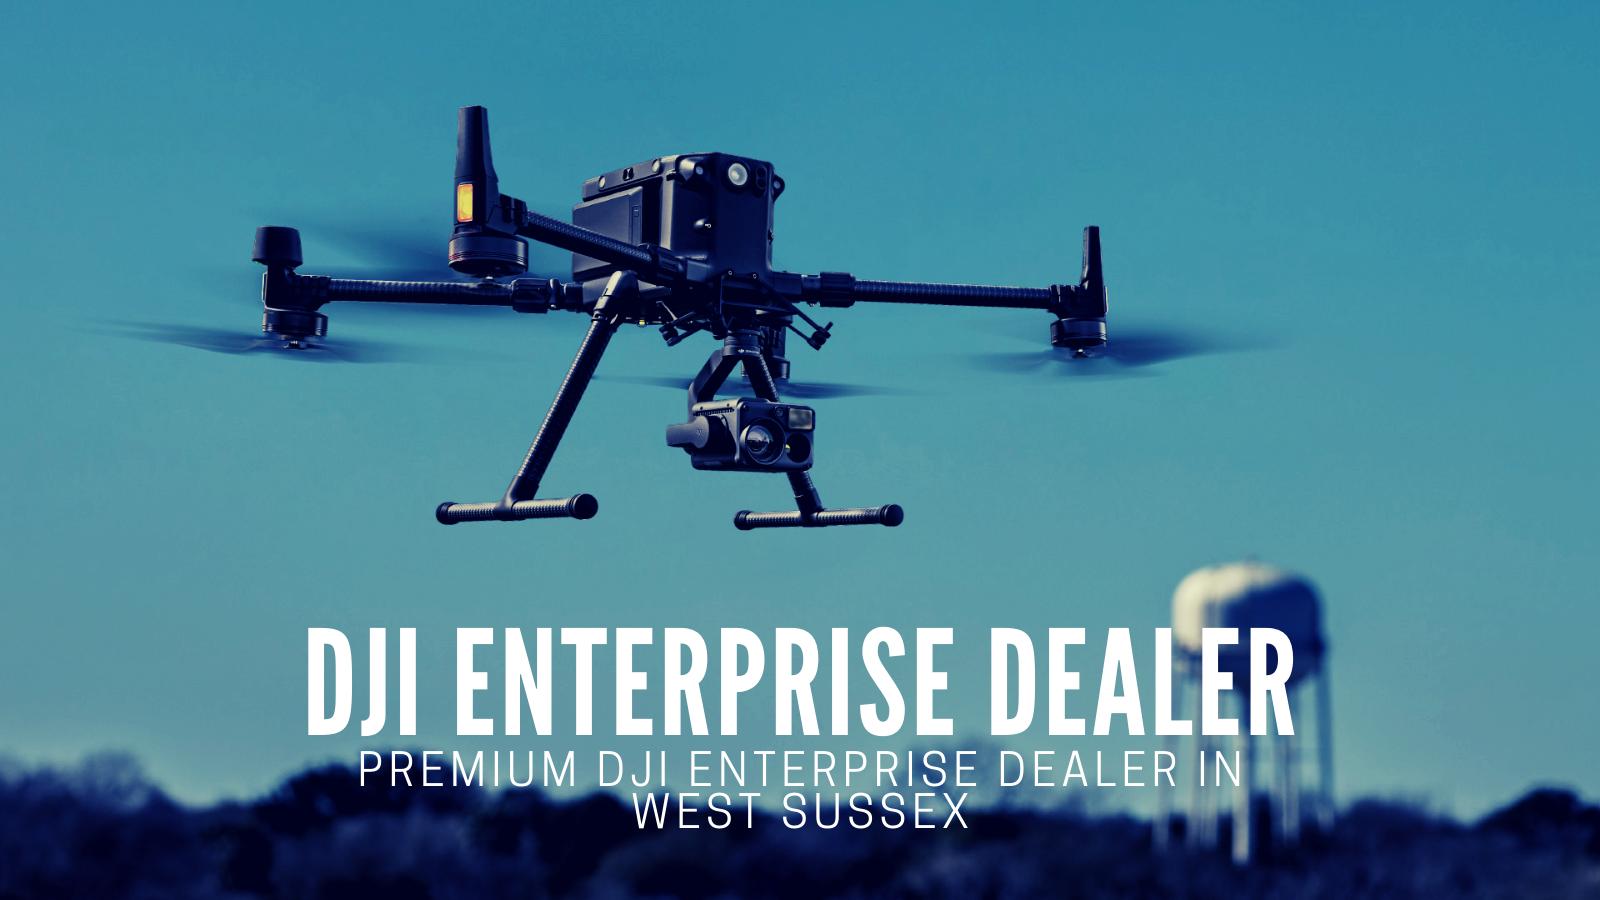 DJI Enterprise Dealer